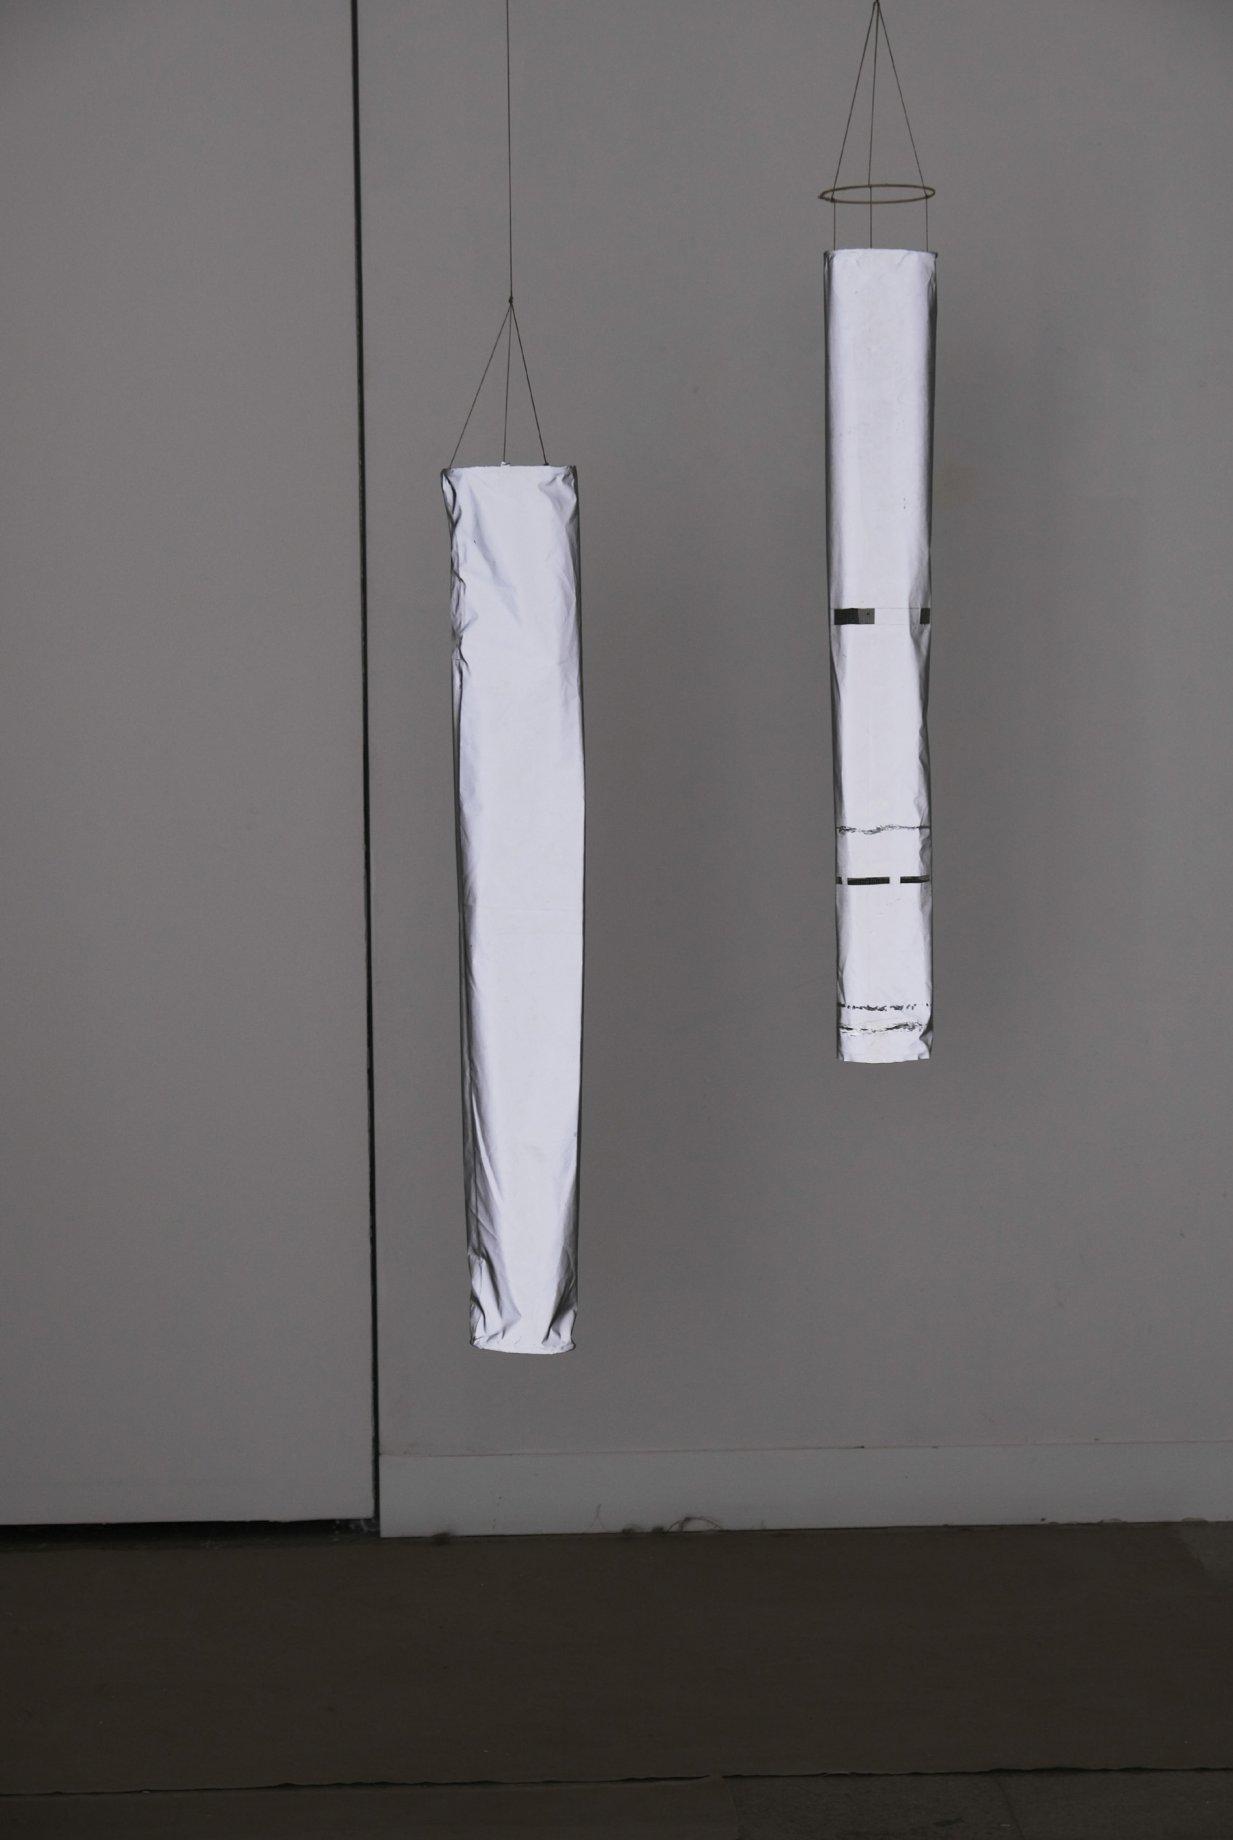 Manga de viento, I y II (2019) - Milena Rossignoli